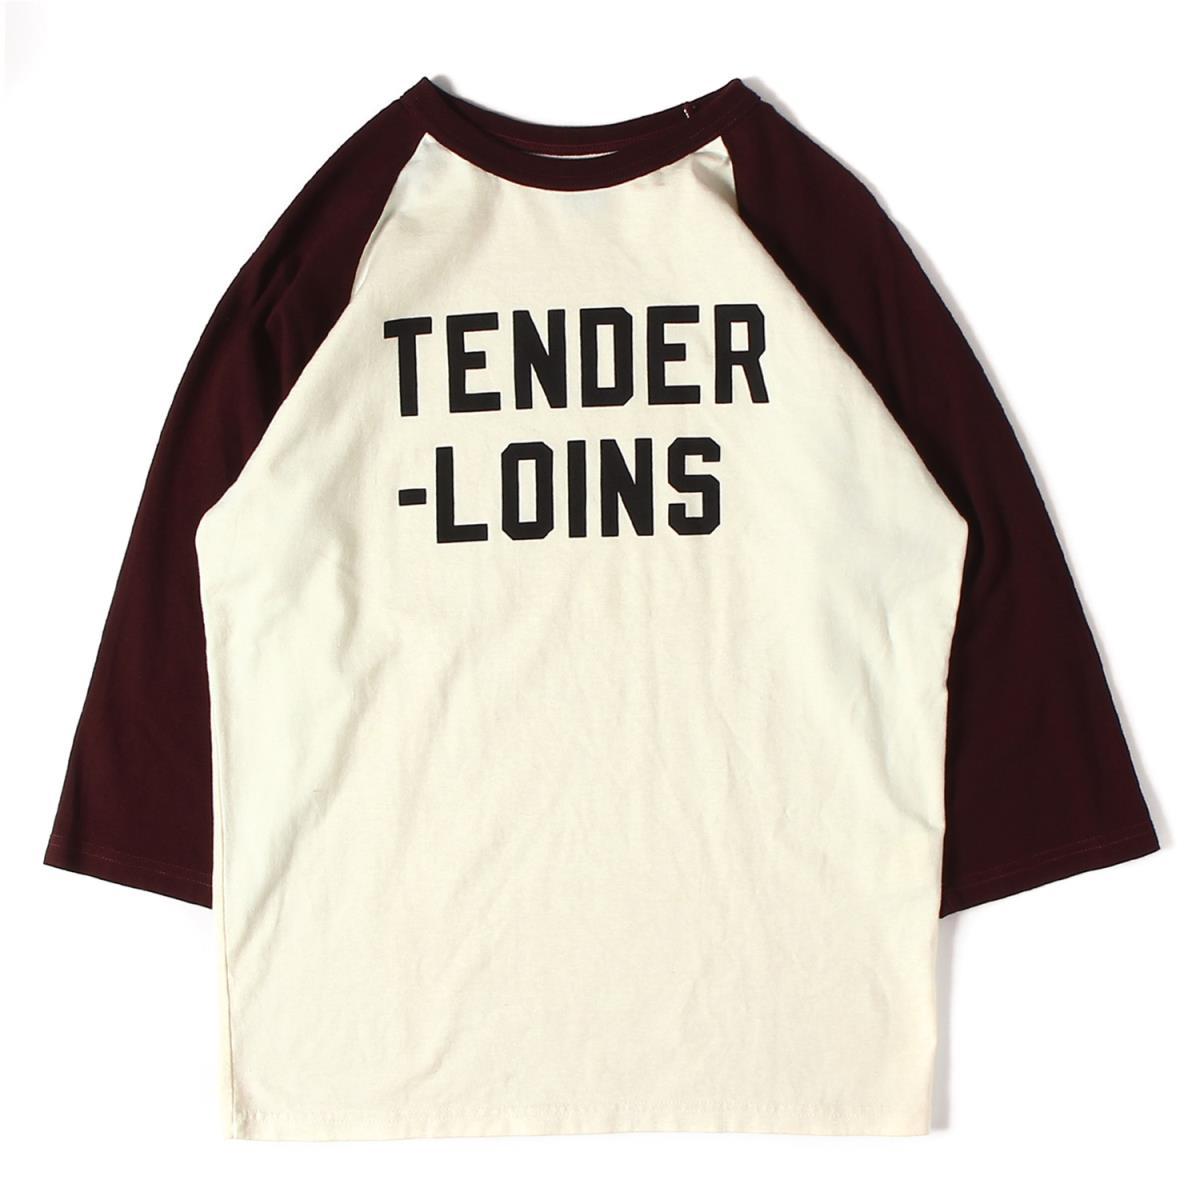 TENDERLOIN (テンダーロイン) ブランドロゴ7分袖ラグランTシャツ(T-RAGLAN) オフホワイト×バーガンディー XS 【新品同様】【メンズ】【K2238】【中古】【あす楽☆対応可】